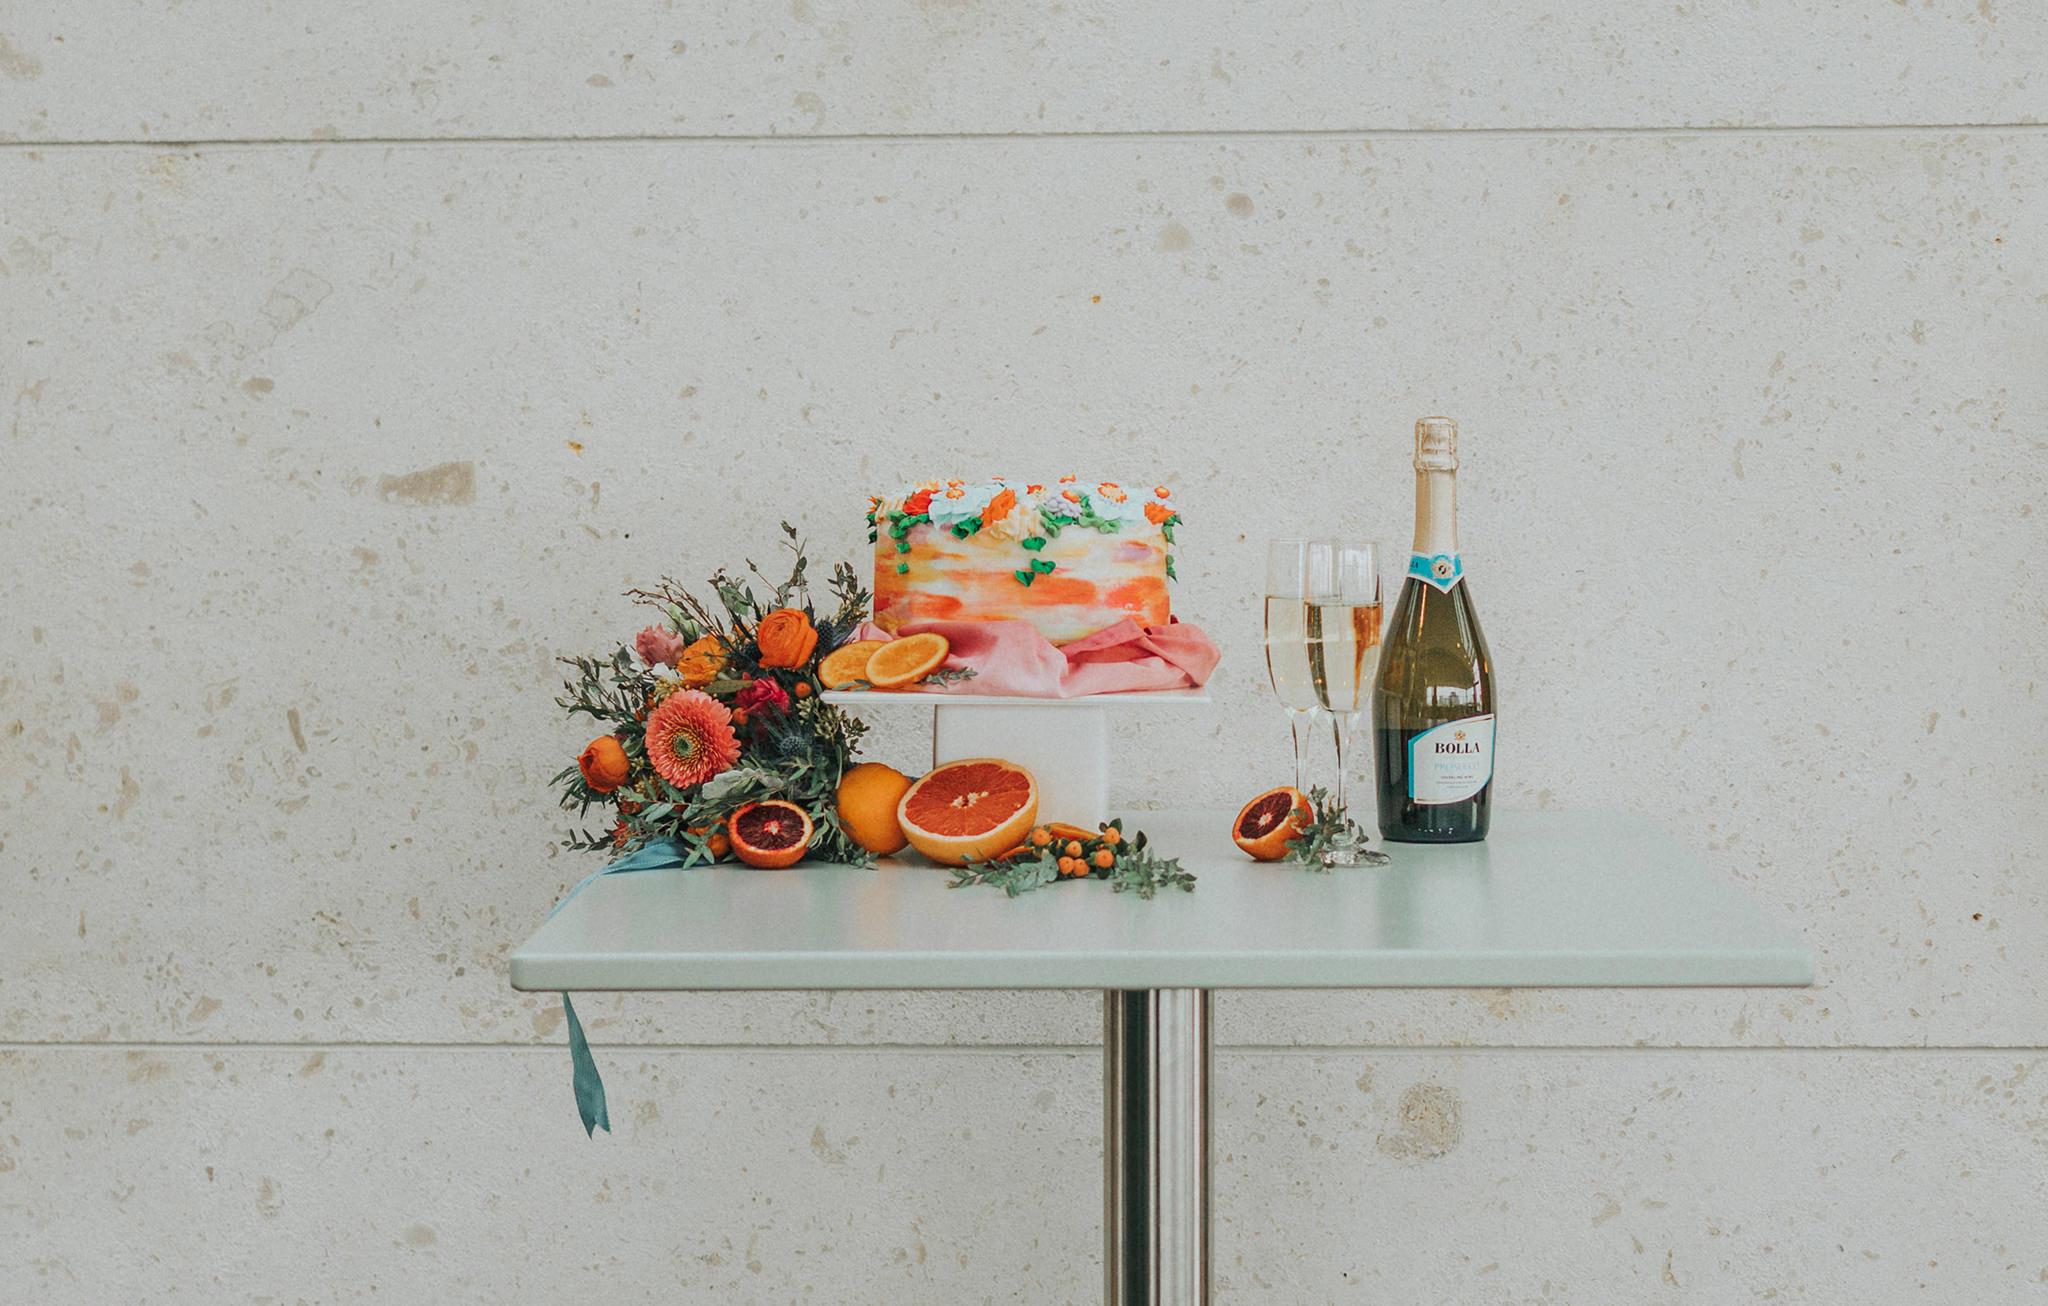 28omaha-wedding-photographer-planner-tiny-luxe-velvet-sage.jpg